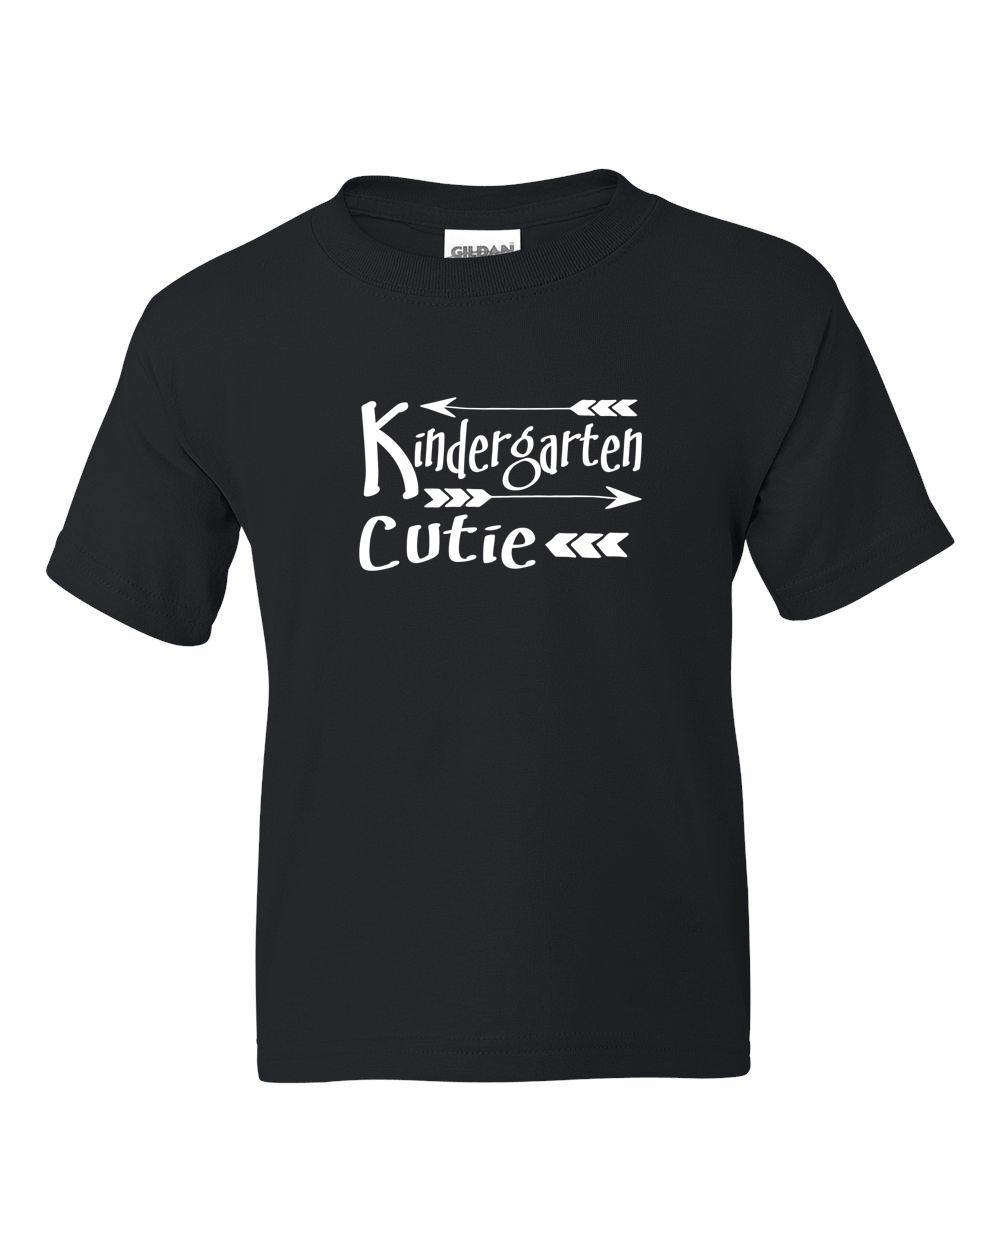 Kindergarten Cutie Back to School Toddler Boy Girl Short Sleeve T-Shirt